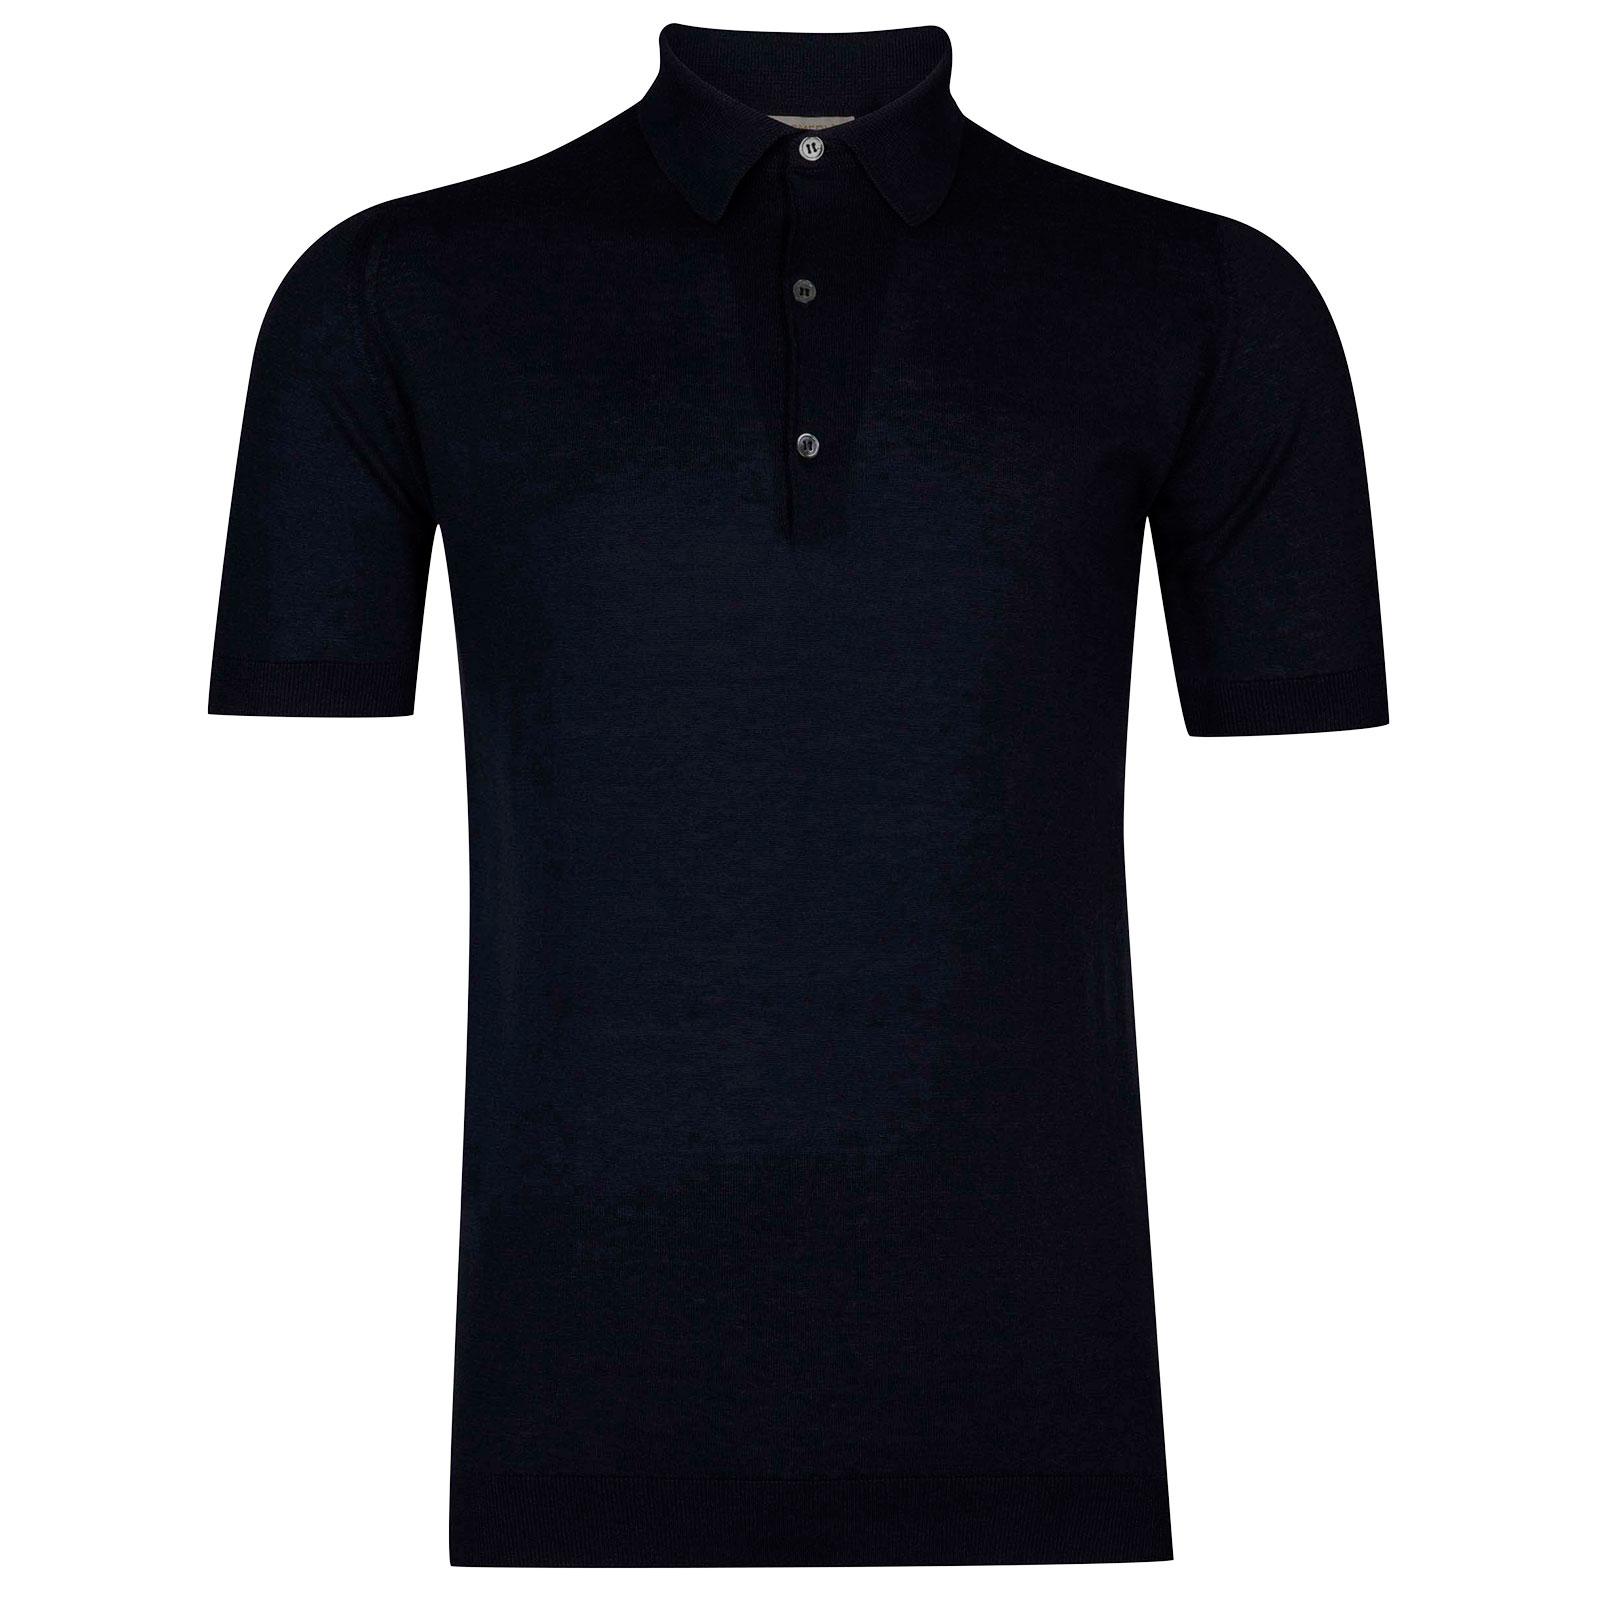 John Smedley Haddon in Navy Shirt-SML